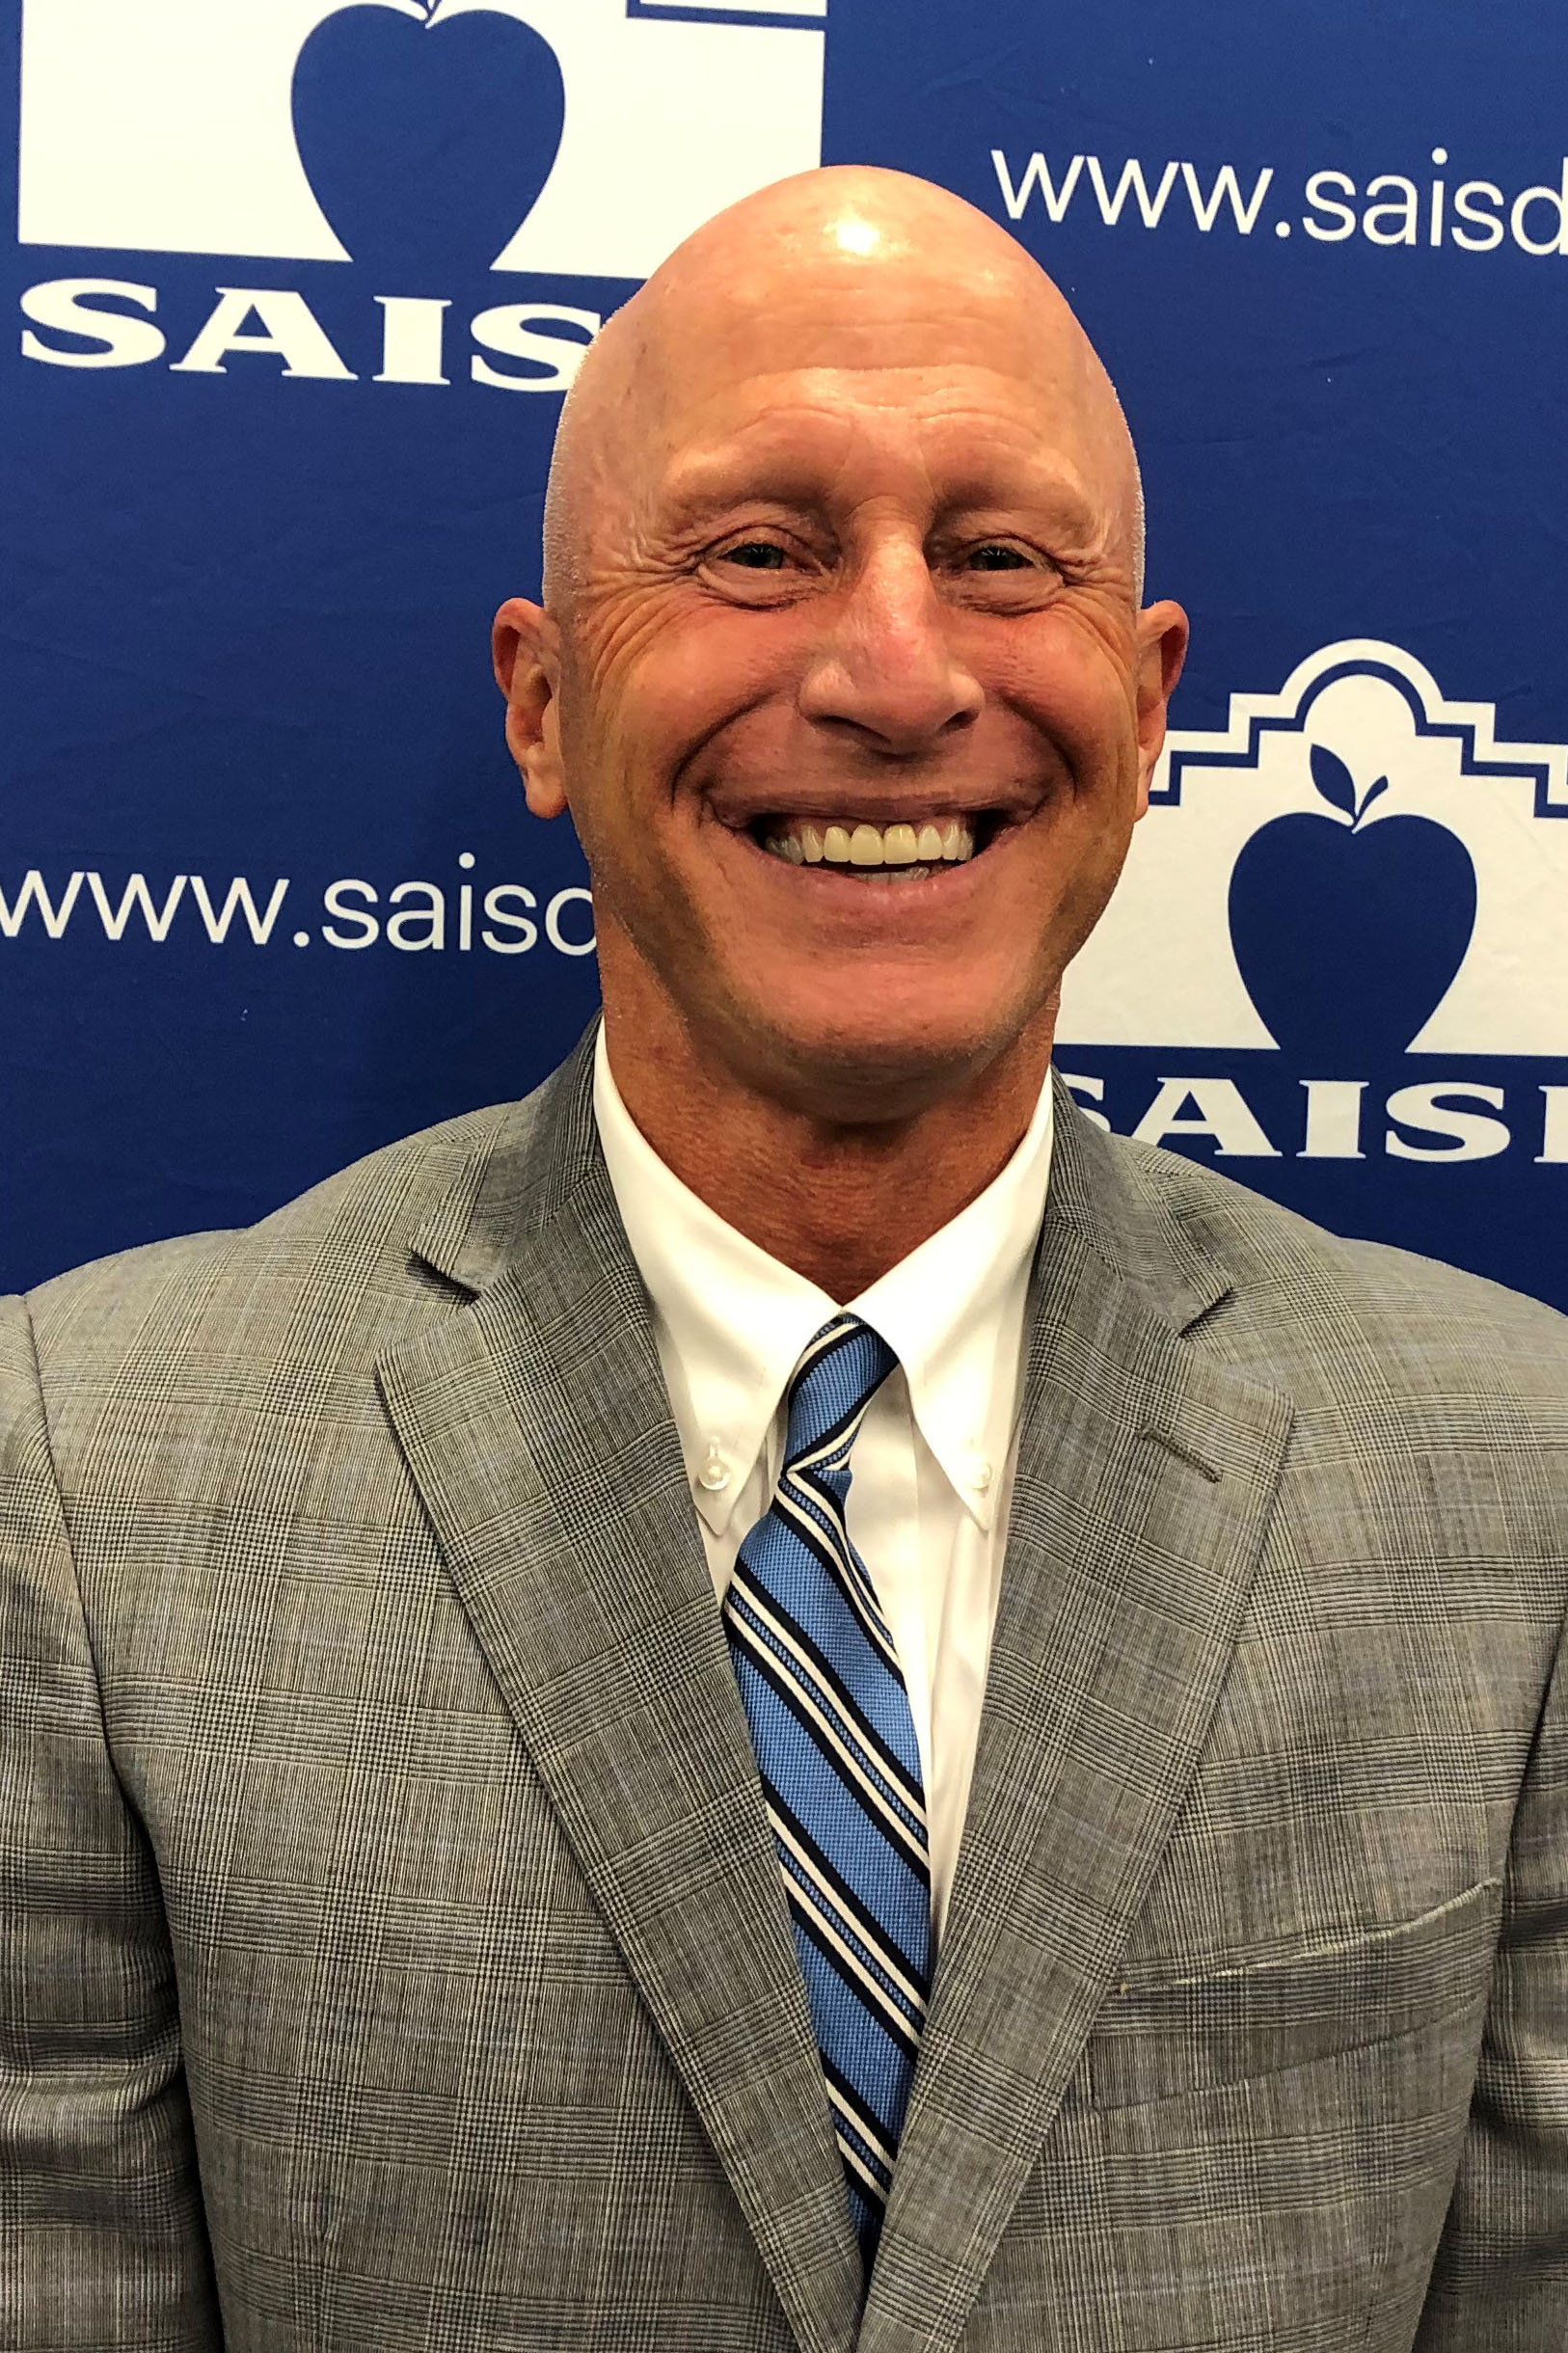 Robert Jaklich, a former superintendent for Harlandale ISD has been named interim-superintendent for SAISD.